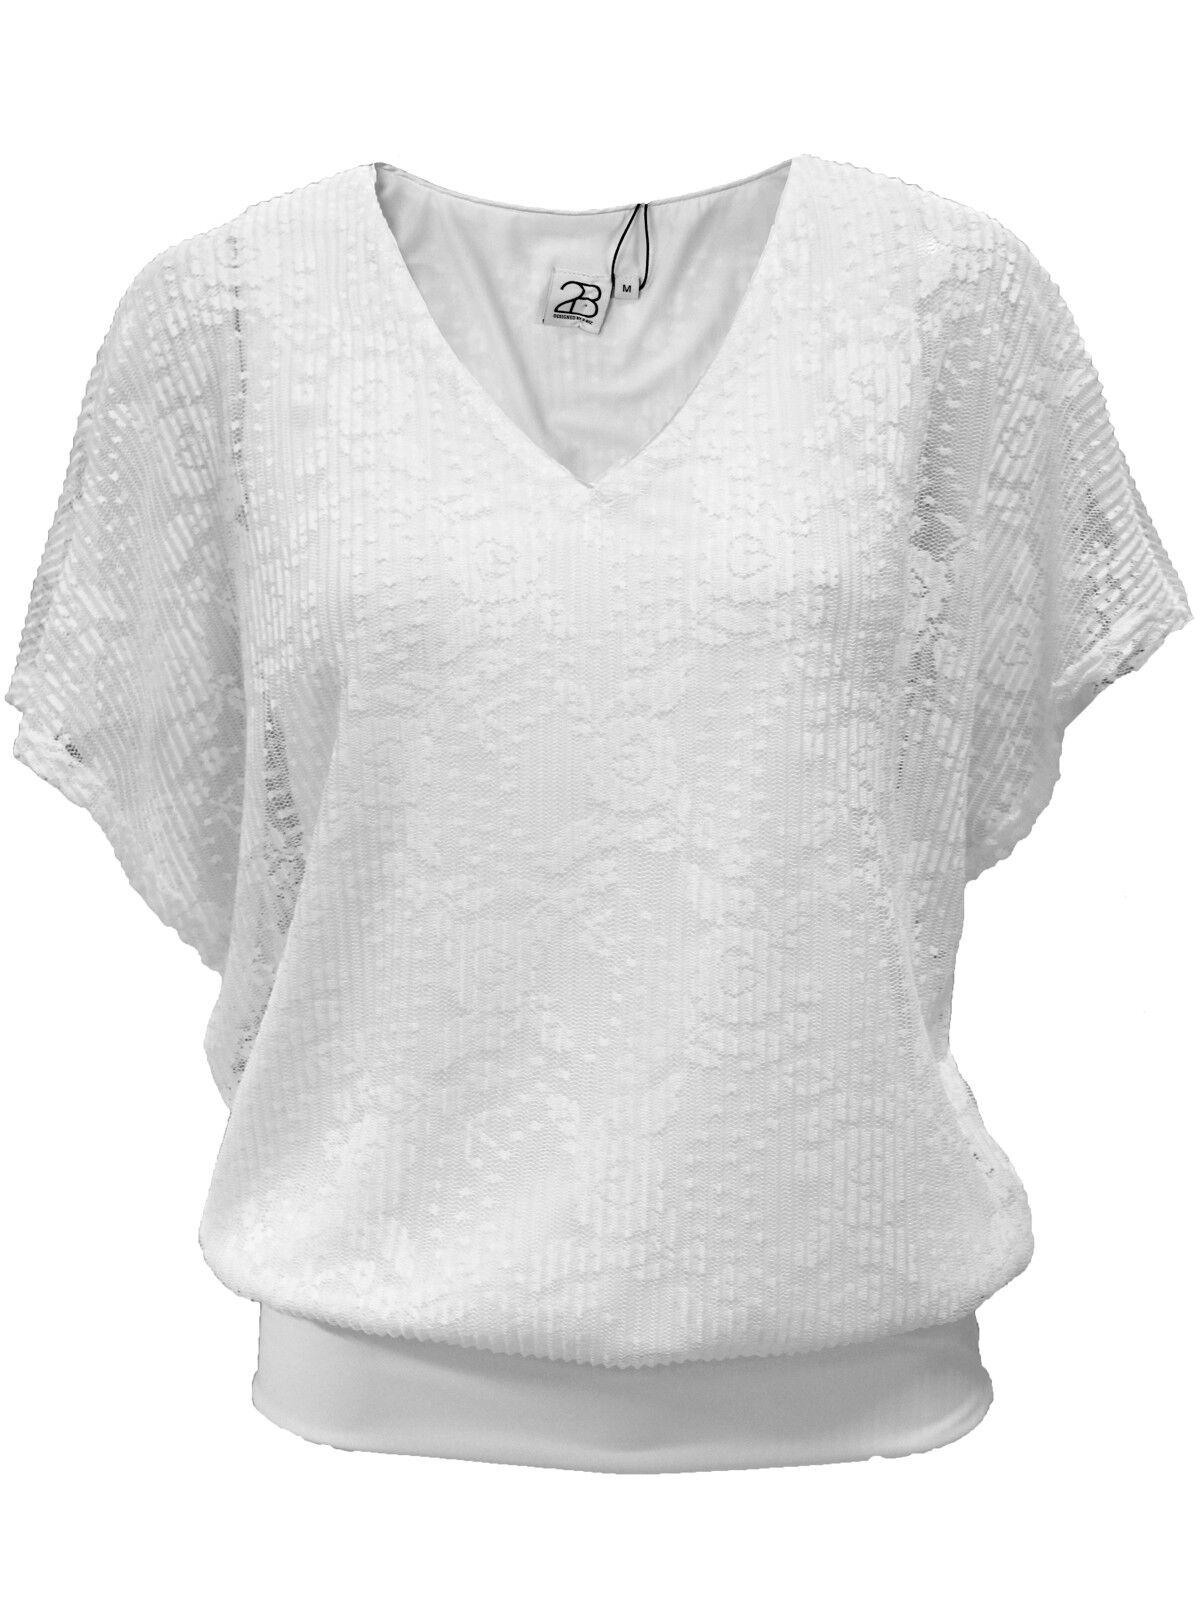 2-Biz Lindan Blouse Weiß Größe XL rrp  DH088 PP 04